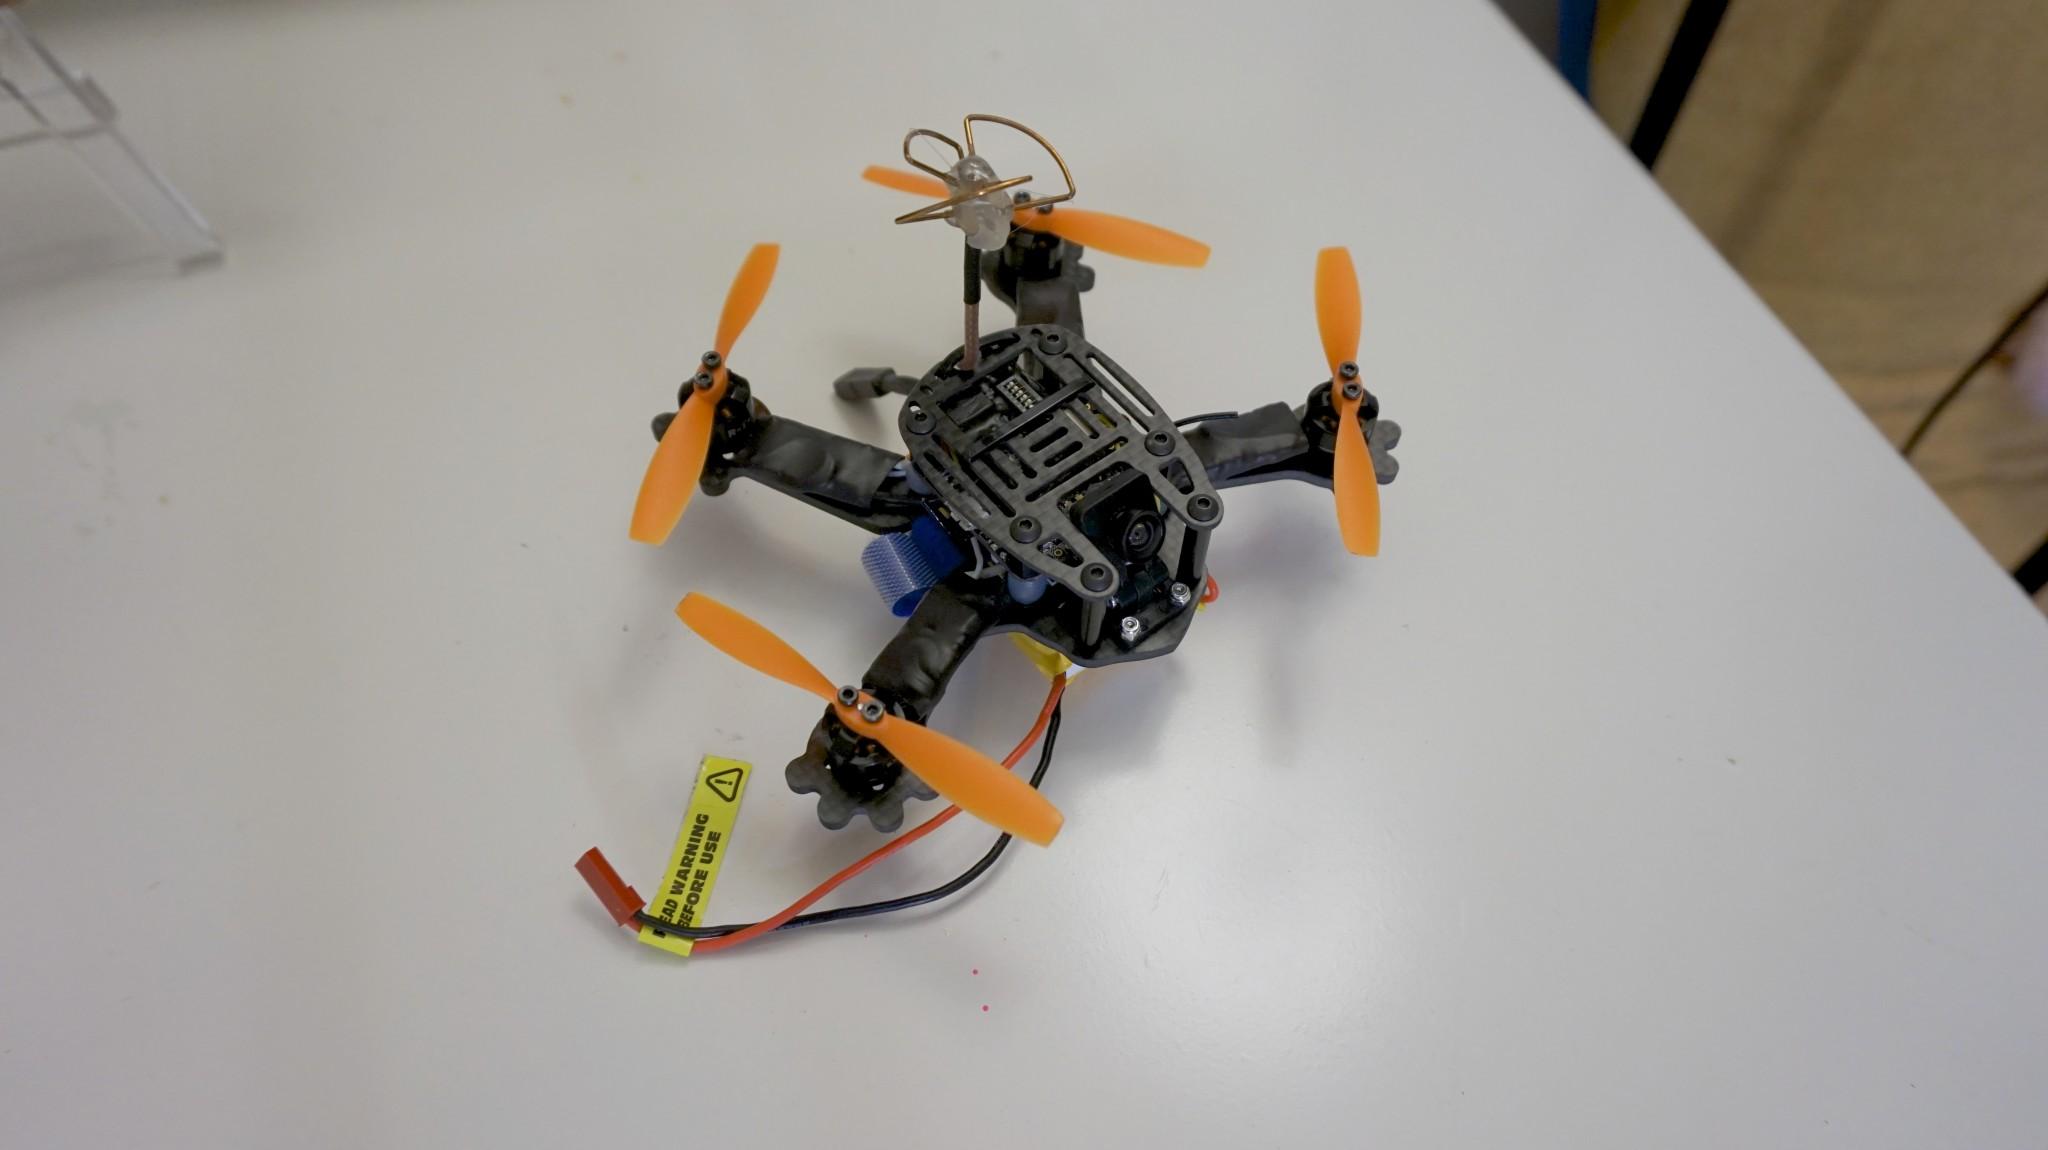 Frog – Micro Racing Quadcopter Frame – Flex RC